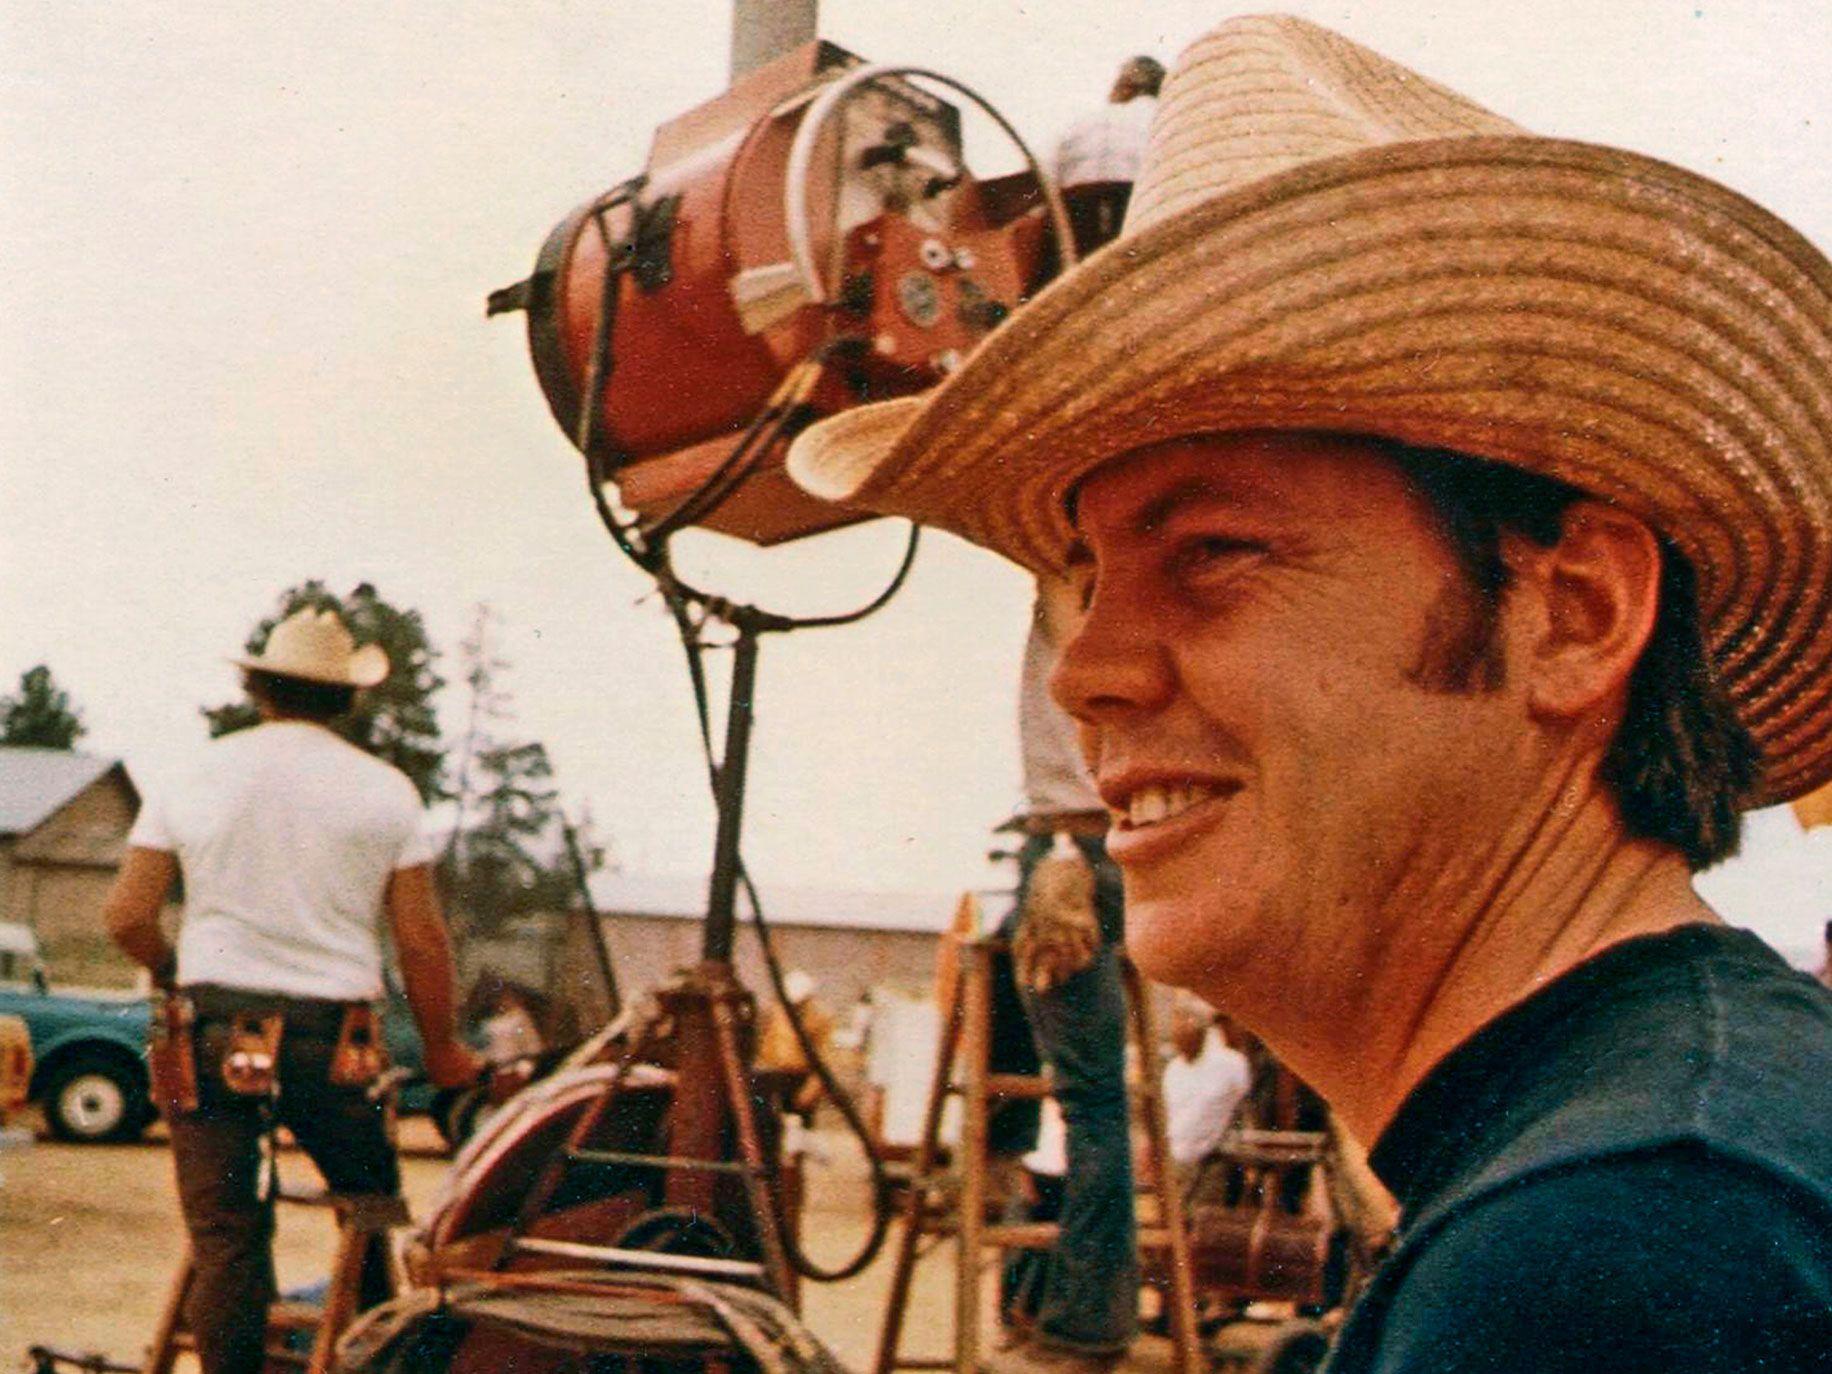 Jeb Rosebrook on set of Junior Bonner.